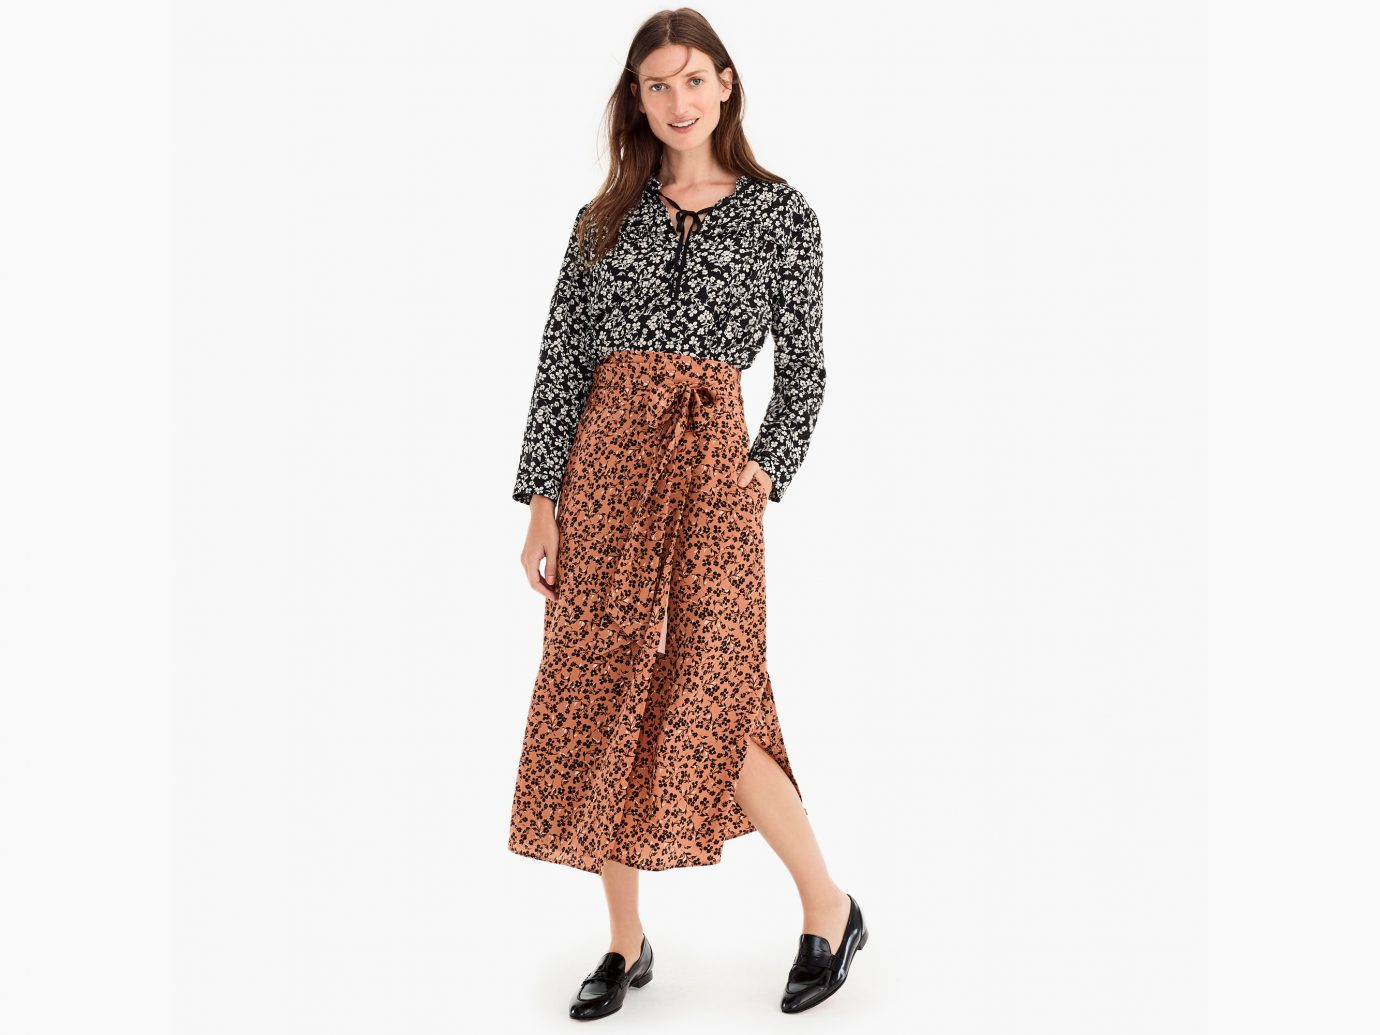 High-Waisted Silk Wrap Skirt in Caramel Blossom Print